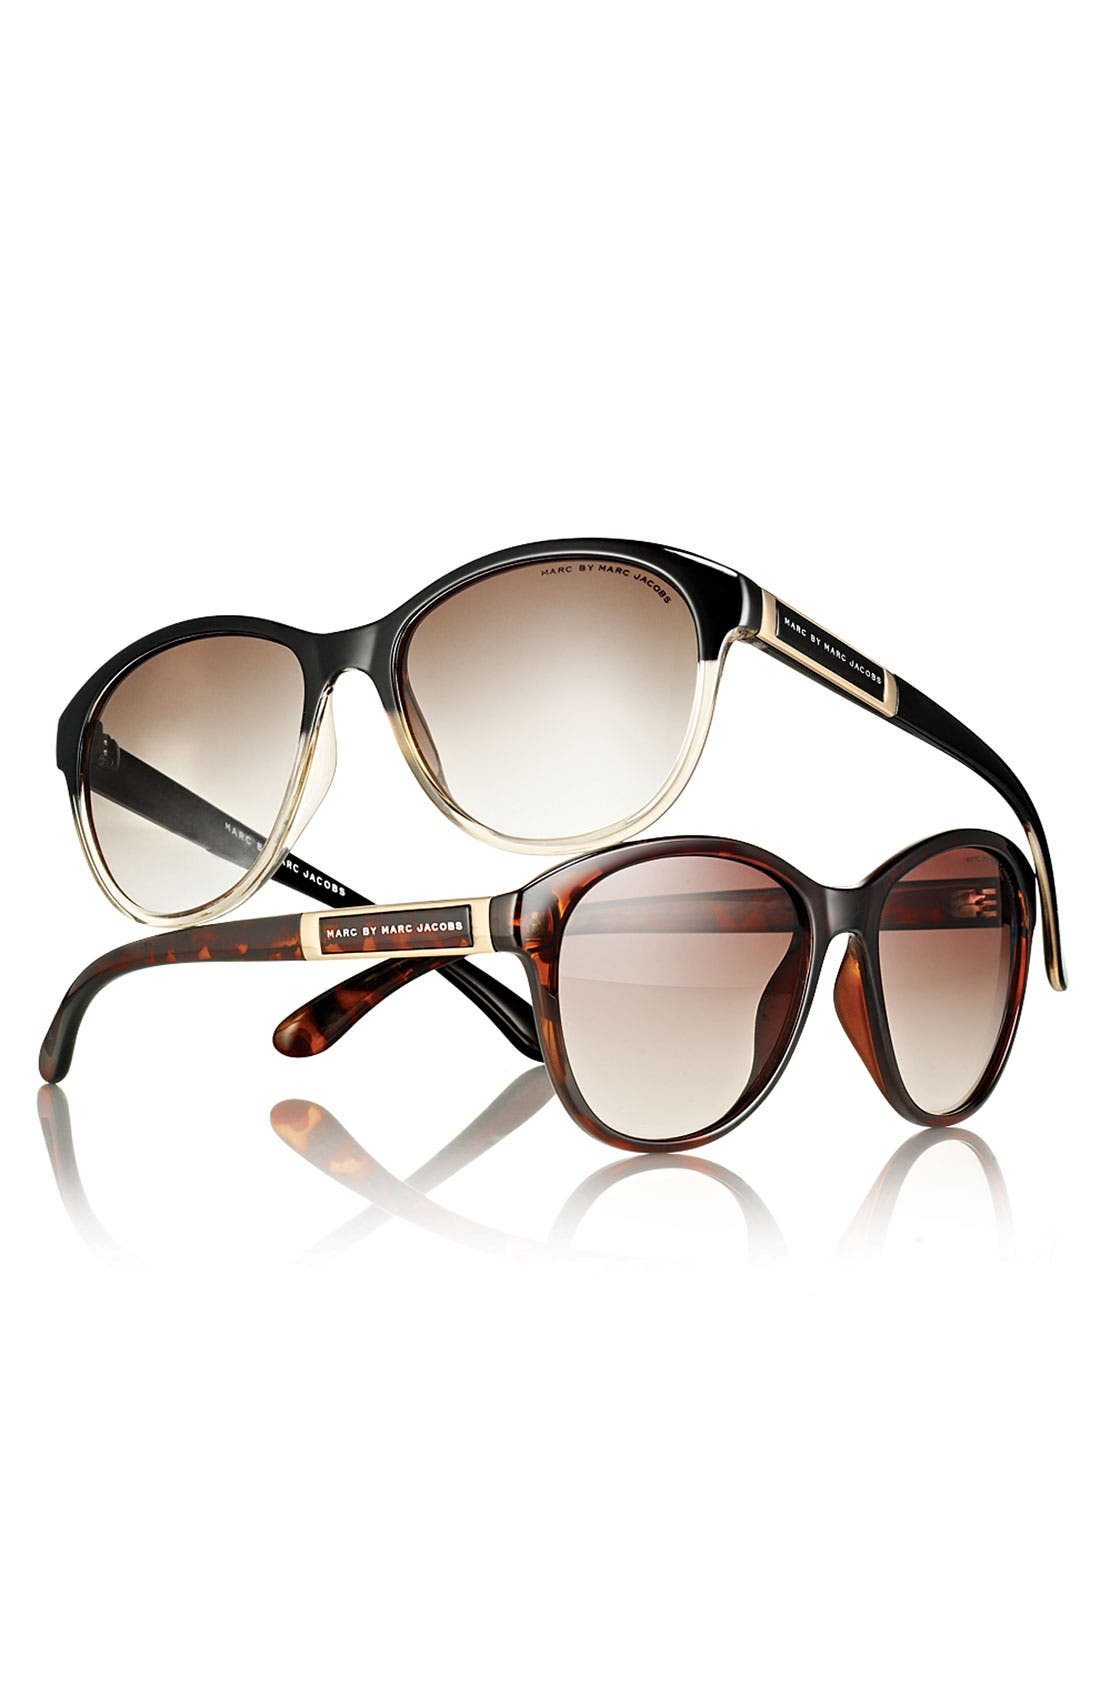 Alternate Image 2  - MARC BY MARC JACOBS Retro Plastic Sunglasses